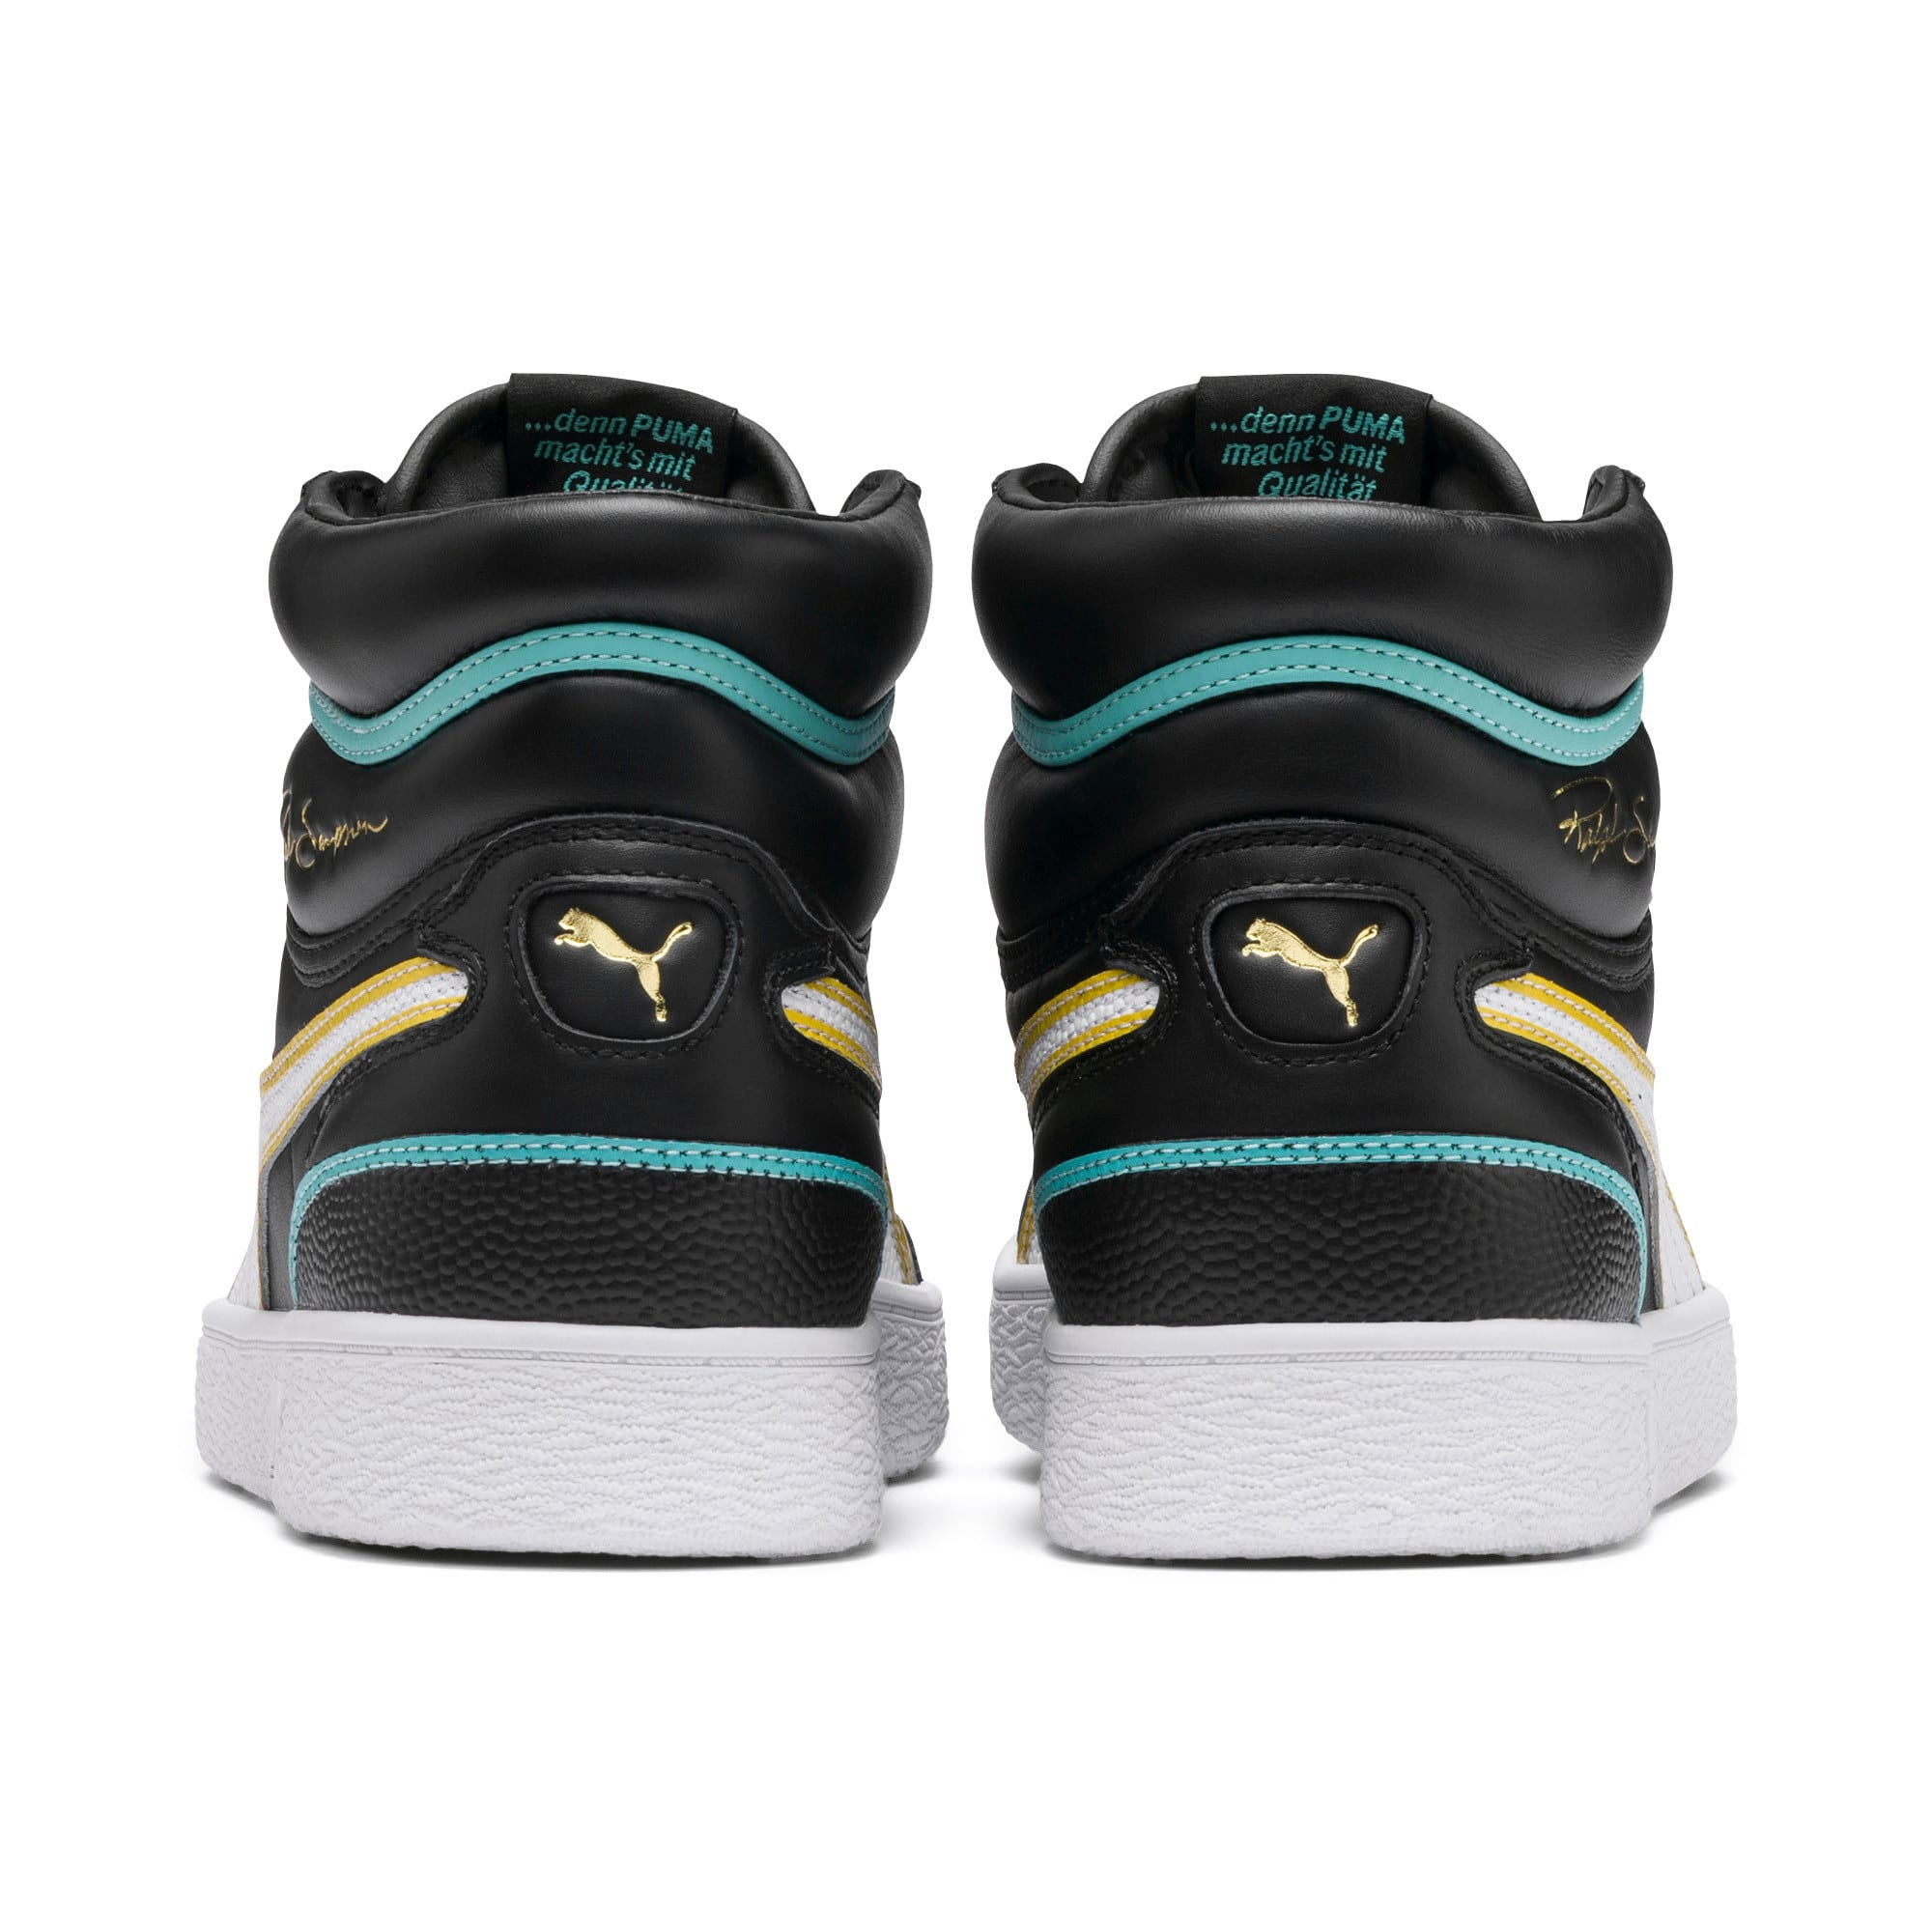 Thumbnail 4 of Ralph Sampson Mid Hoops Sneakers, Puma Blk-Puma Wht-Puma Wht, medium